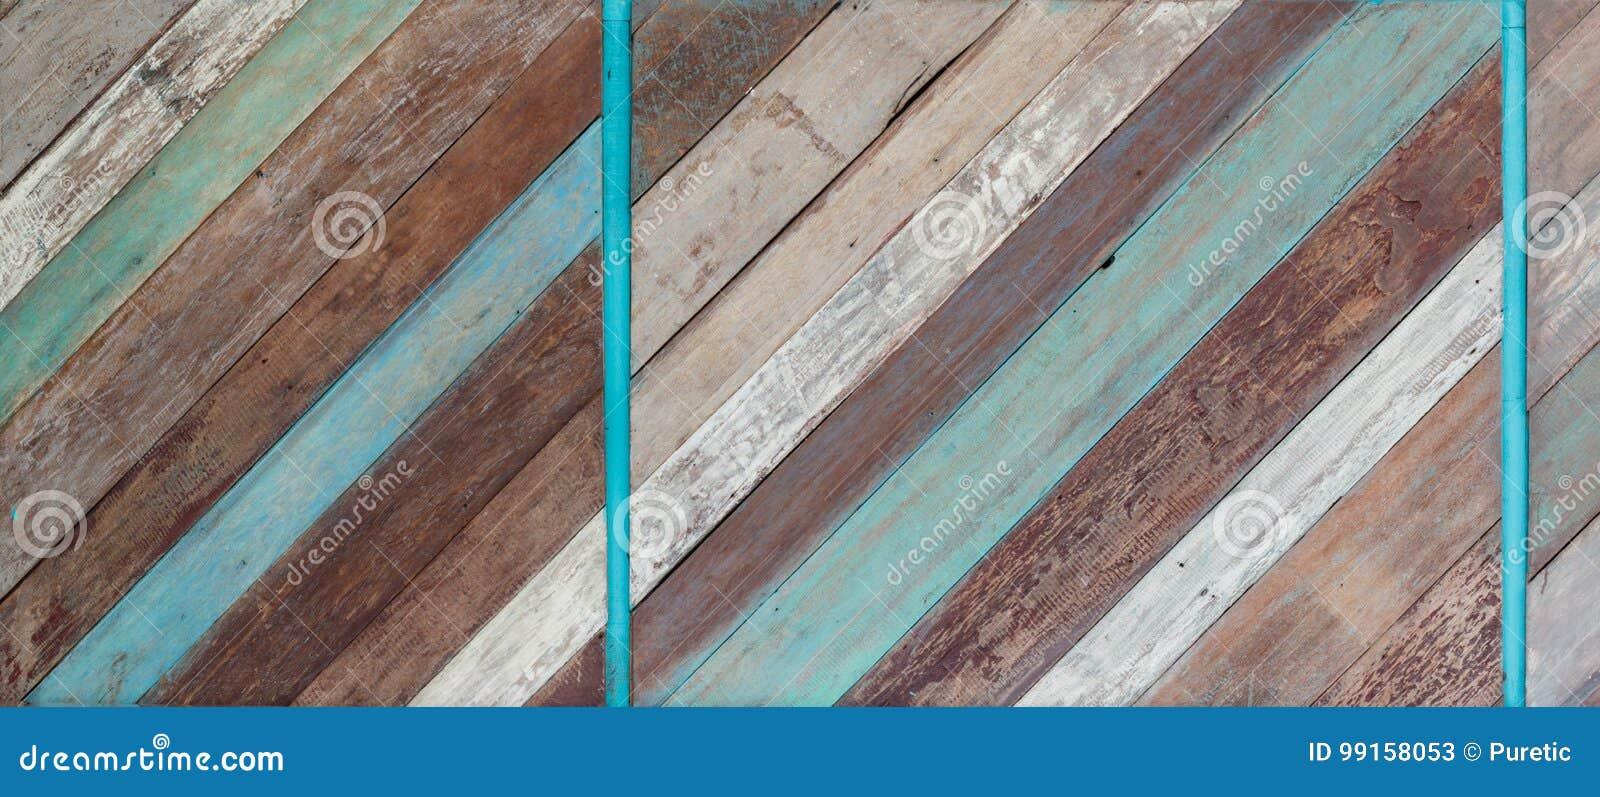 Vieja textura de madera pintada del fondo